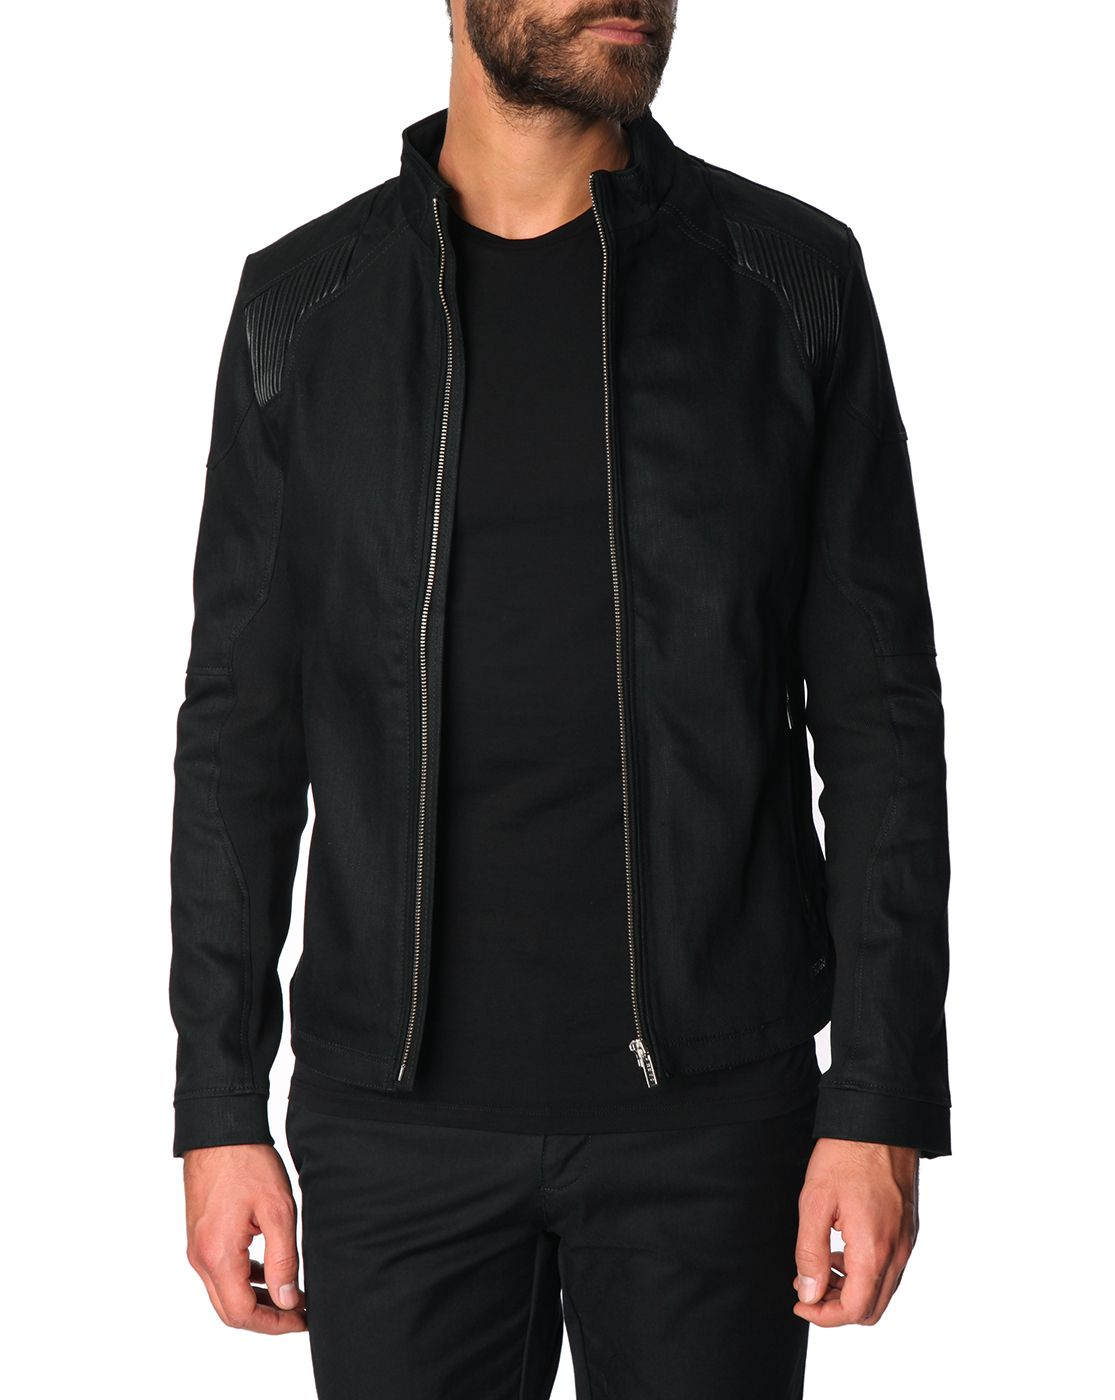 Denim Biker Jacket with Black Patches